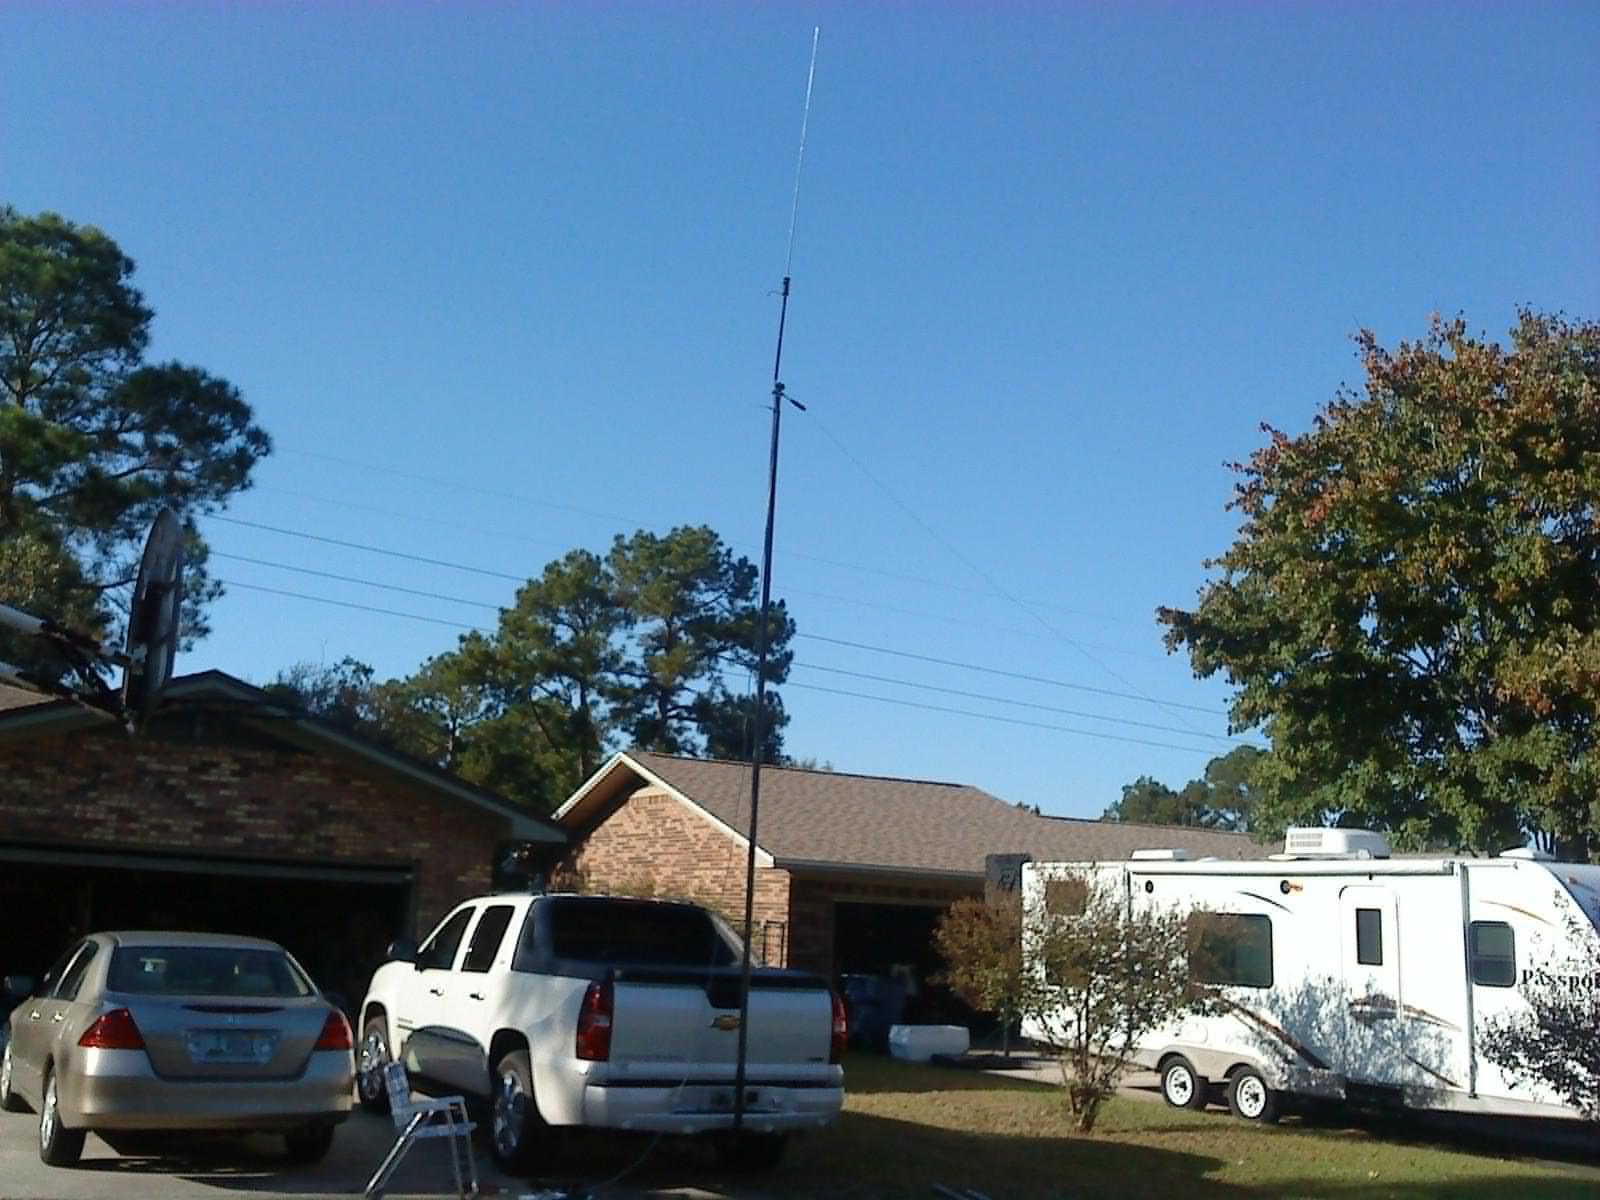 N4KGL - RaDAR: Portable Antennas based on hitch mount mast